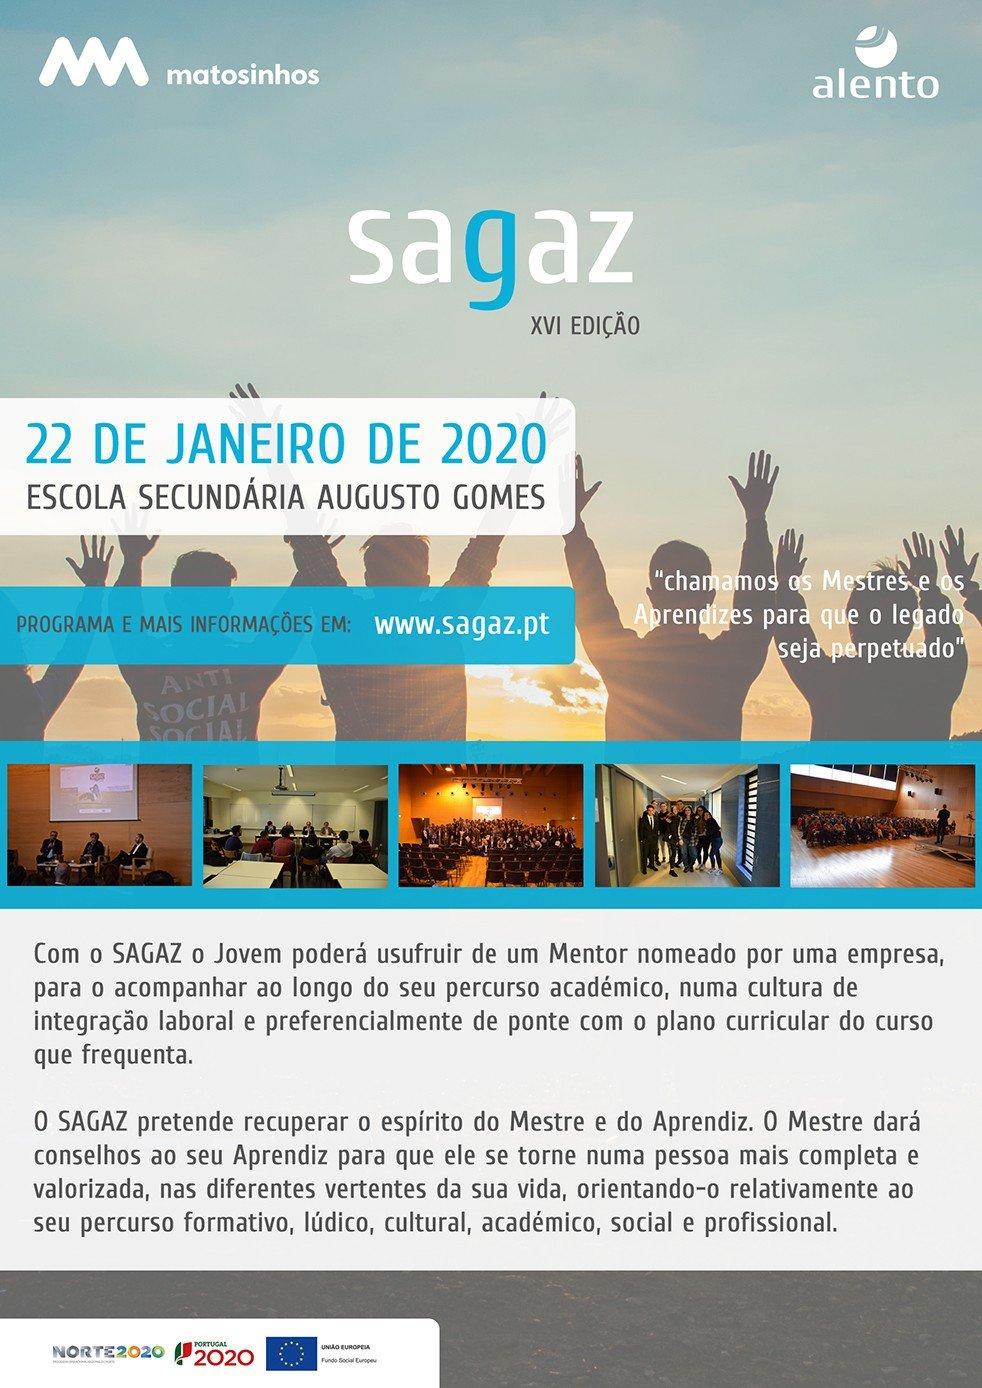 Sagaz Matosinhos 2020